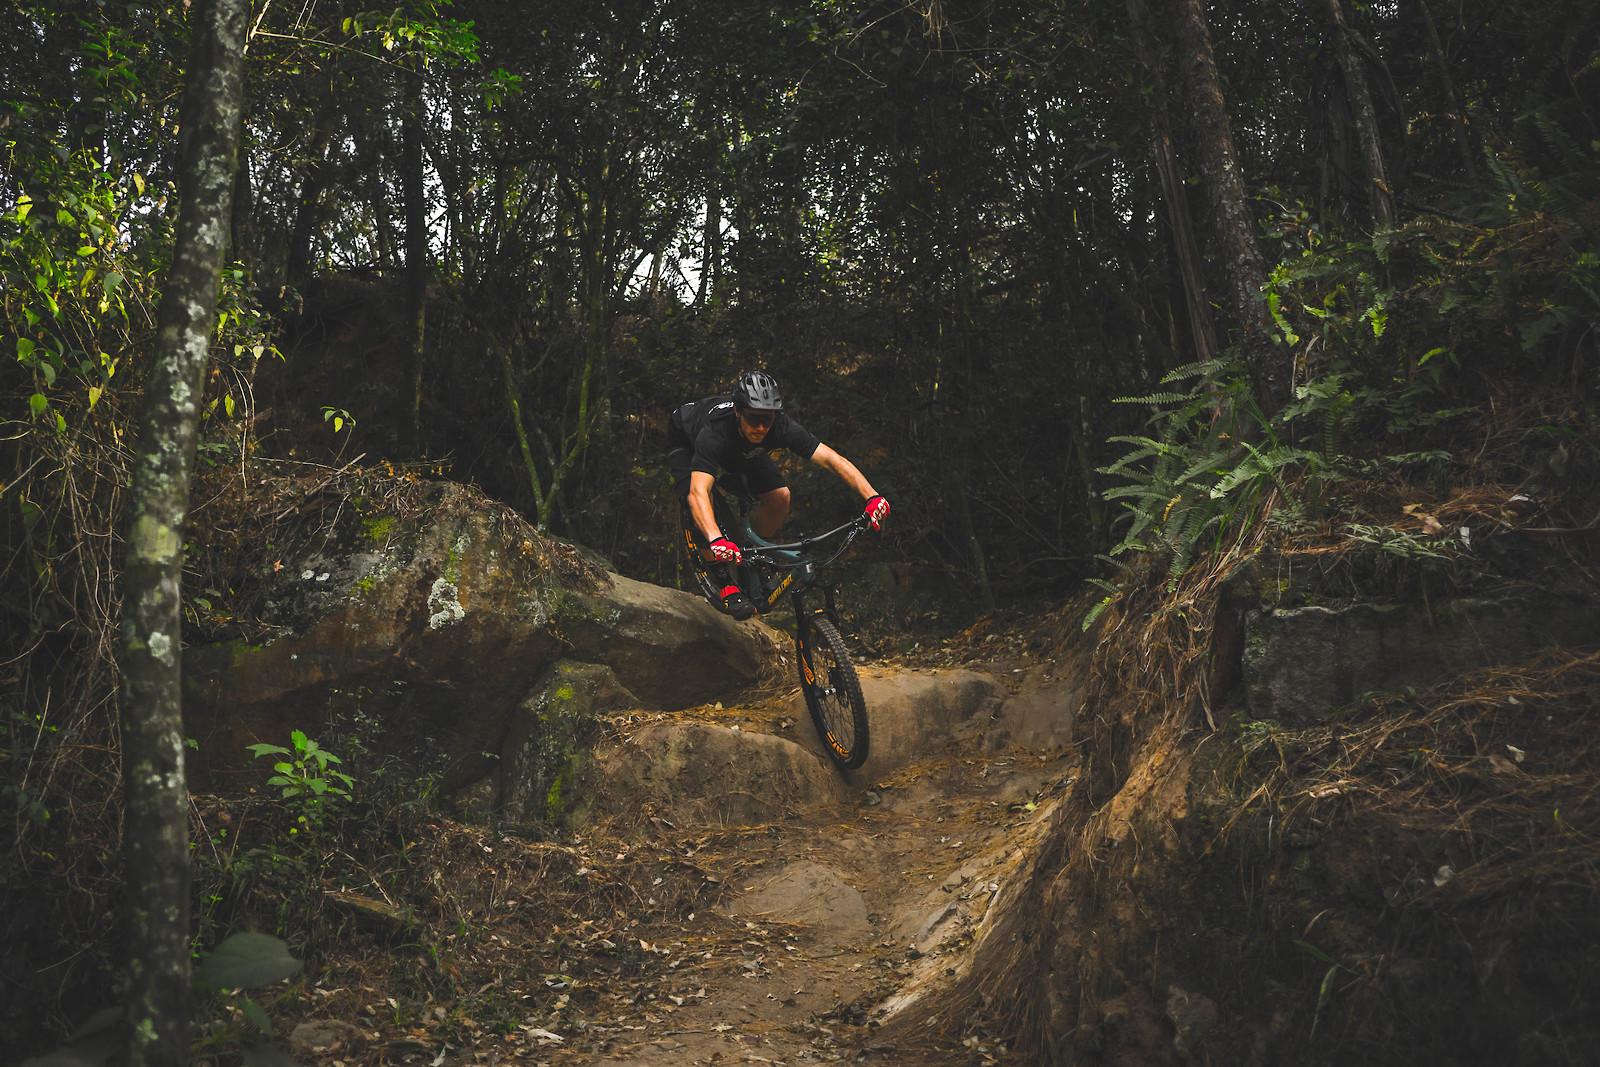 Jungle Drops - Its.Peteee - Mountain Biking Pictures - Vital MTB